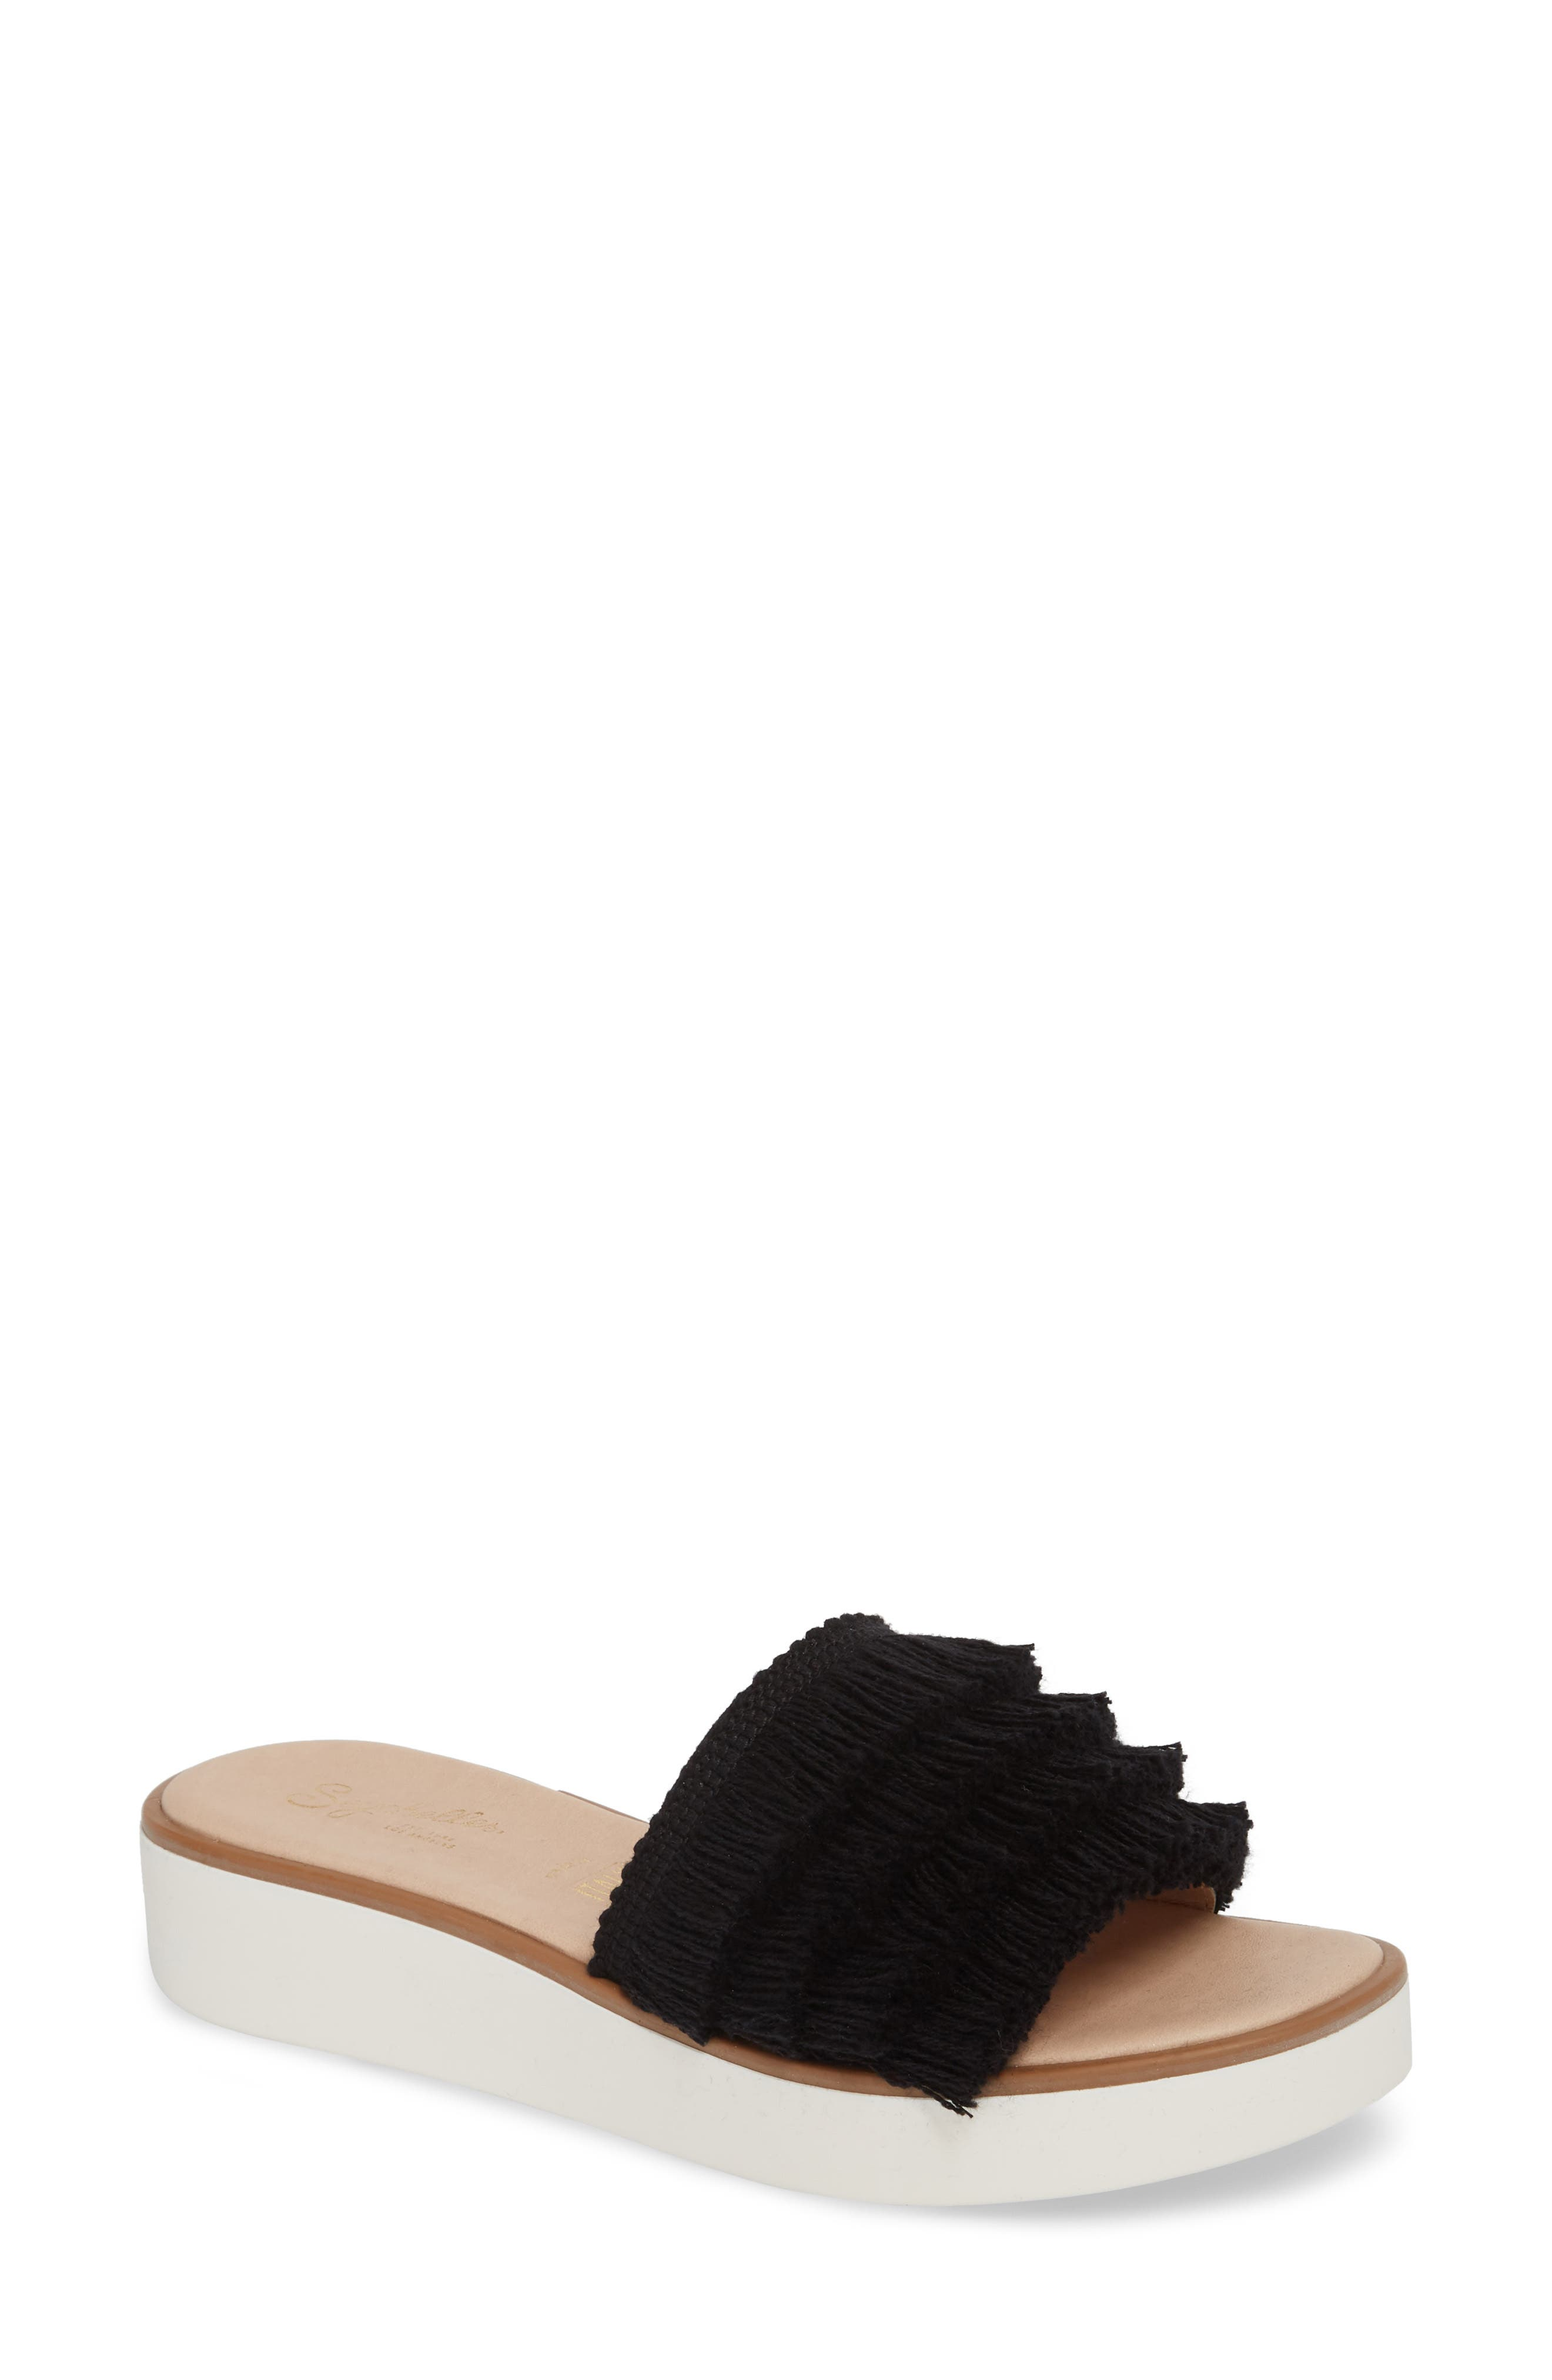 Well Rested Ruffle Slide Sandal,                             Main thumbnail 1, color,                             001